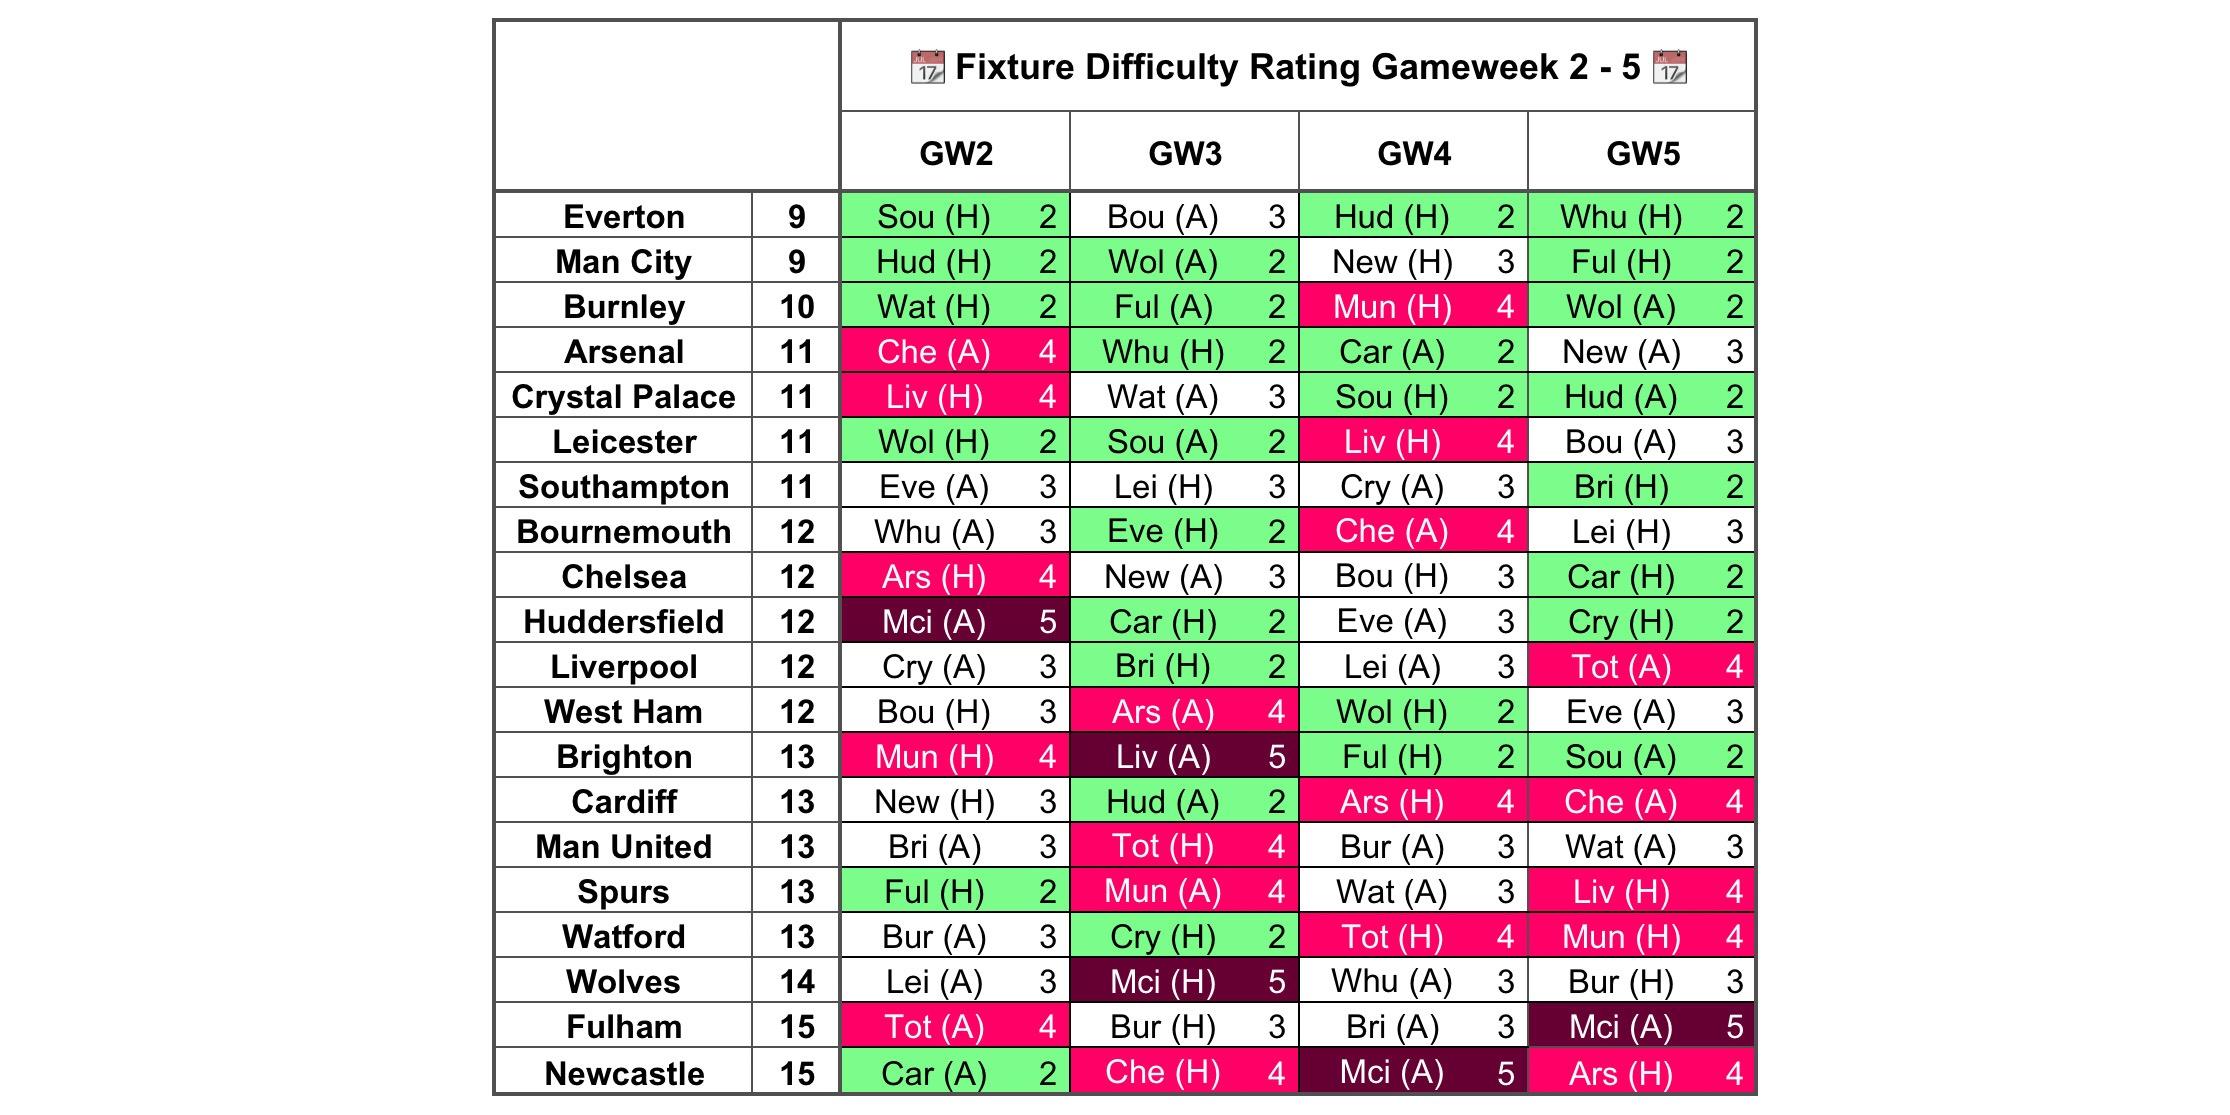 Gameweek 2 Fixture